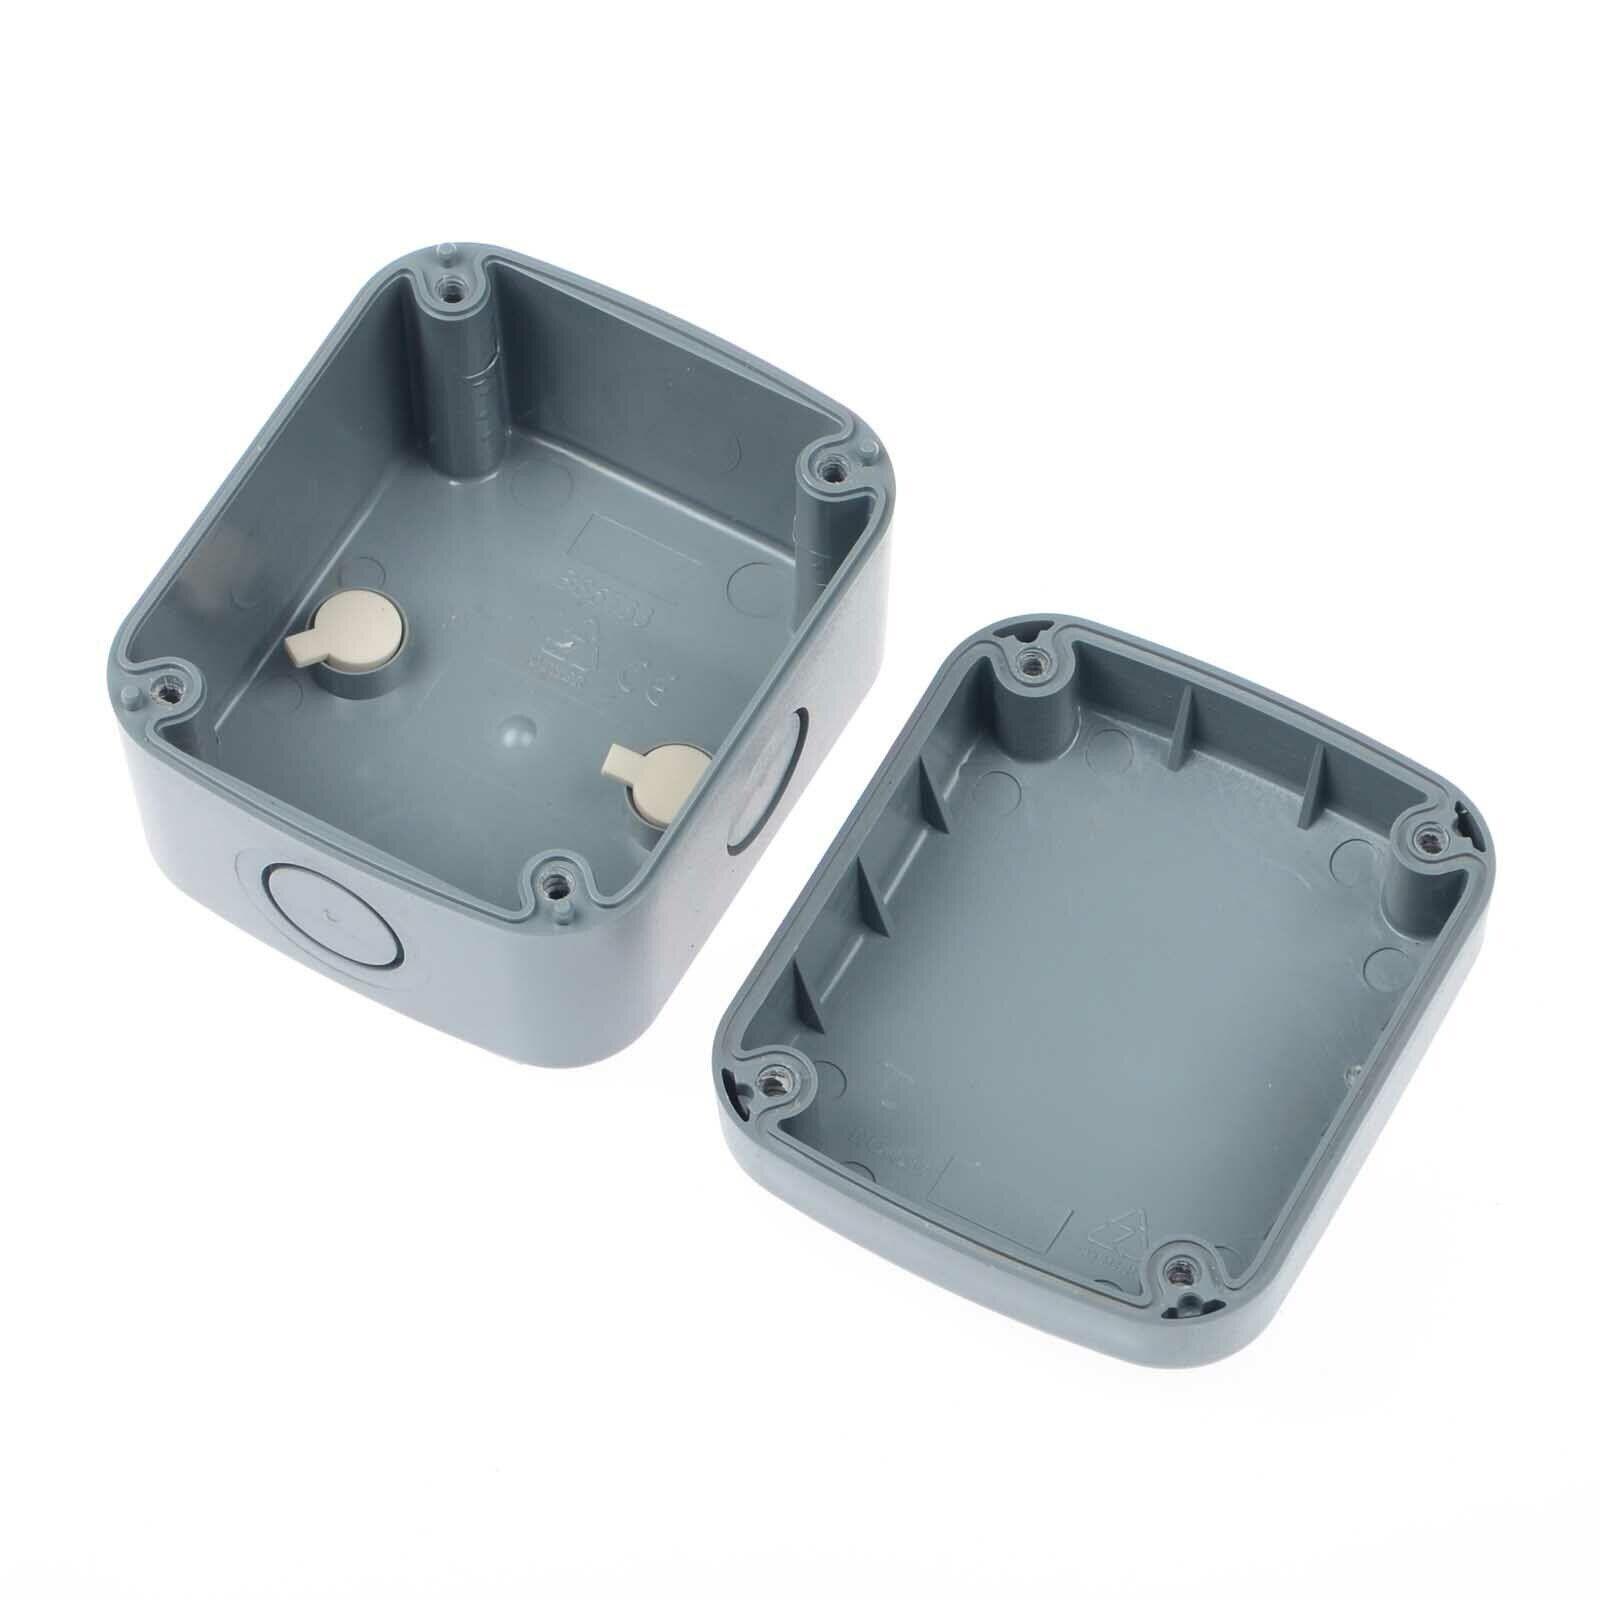 Black Electric IP66 Junction Box /& Outdoor Waterproof 86×74×62mm Weatherproof